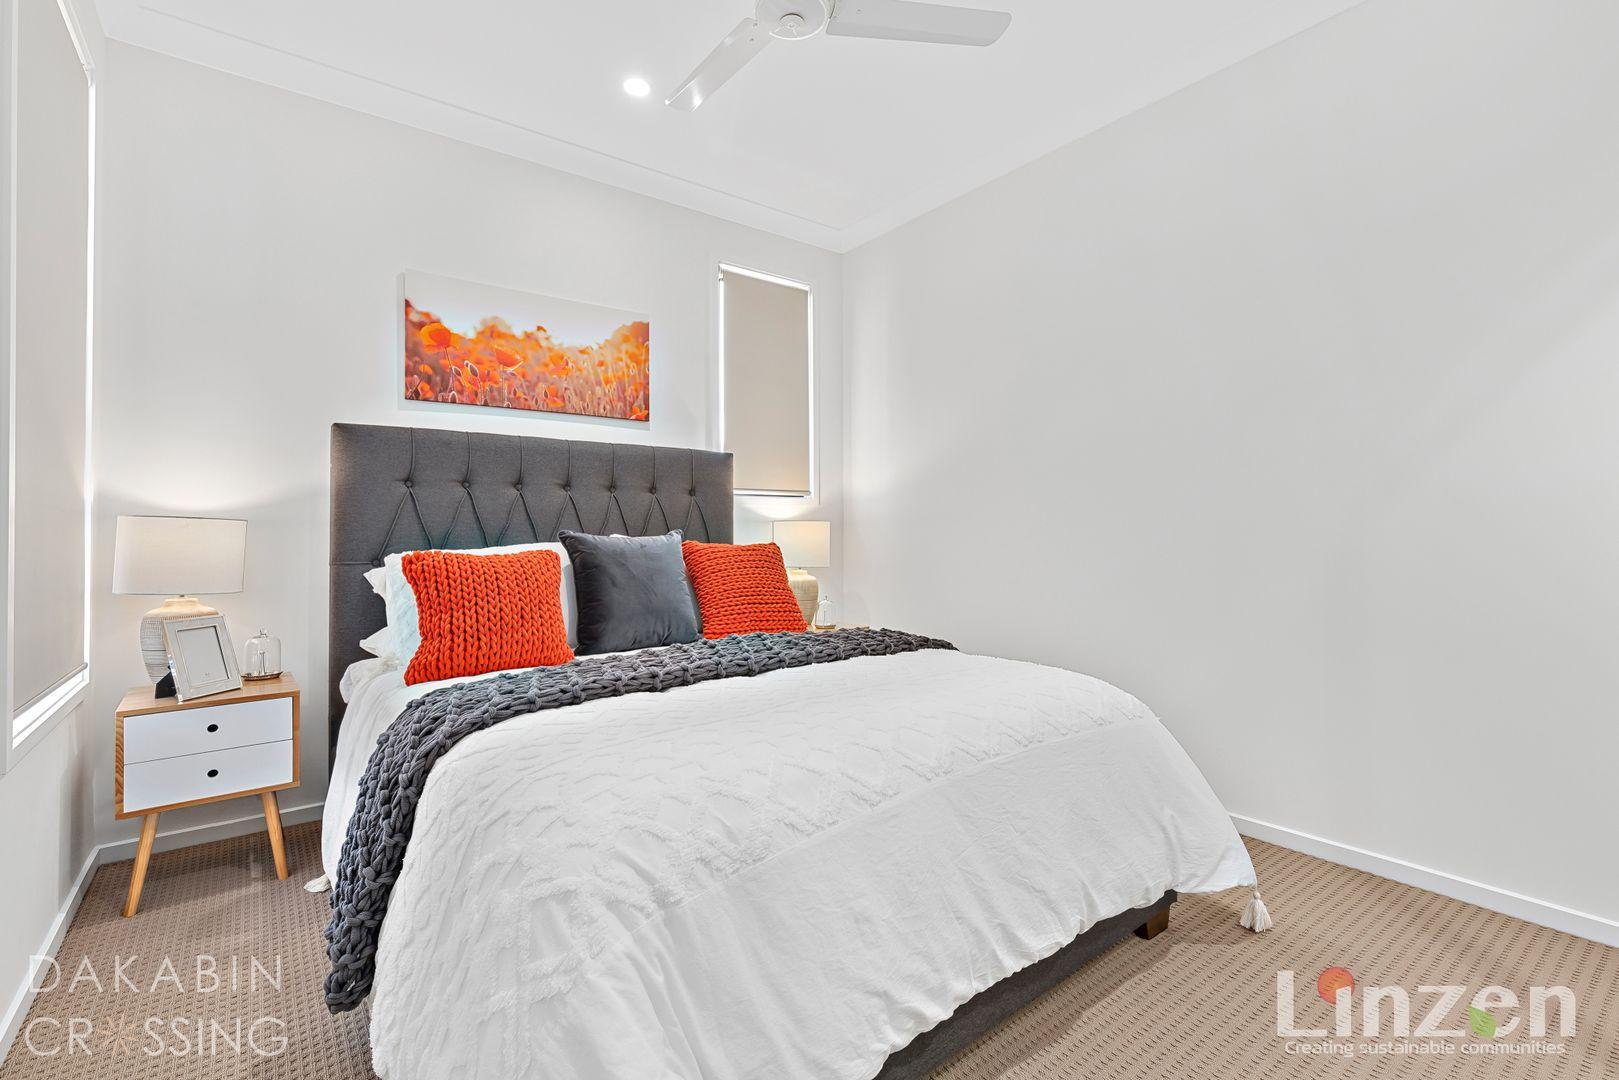 140 Alma Road, Dakabin QLD 4503, Image 2